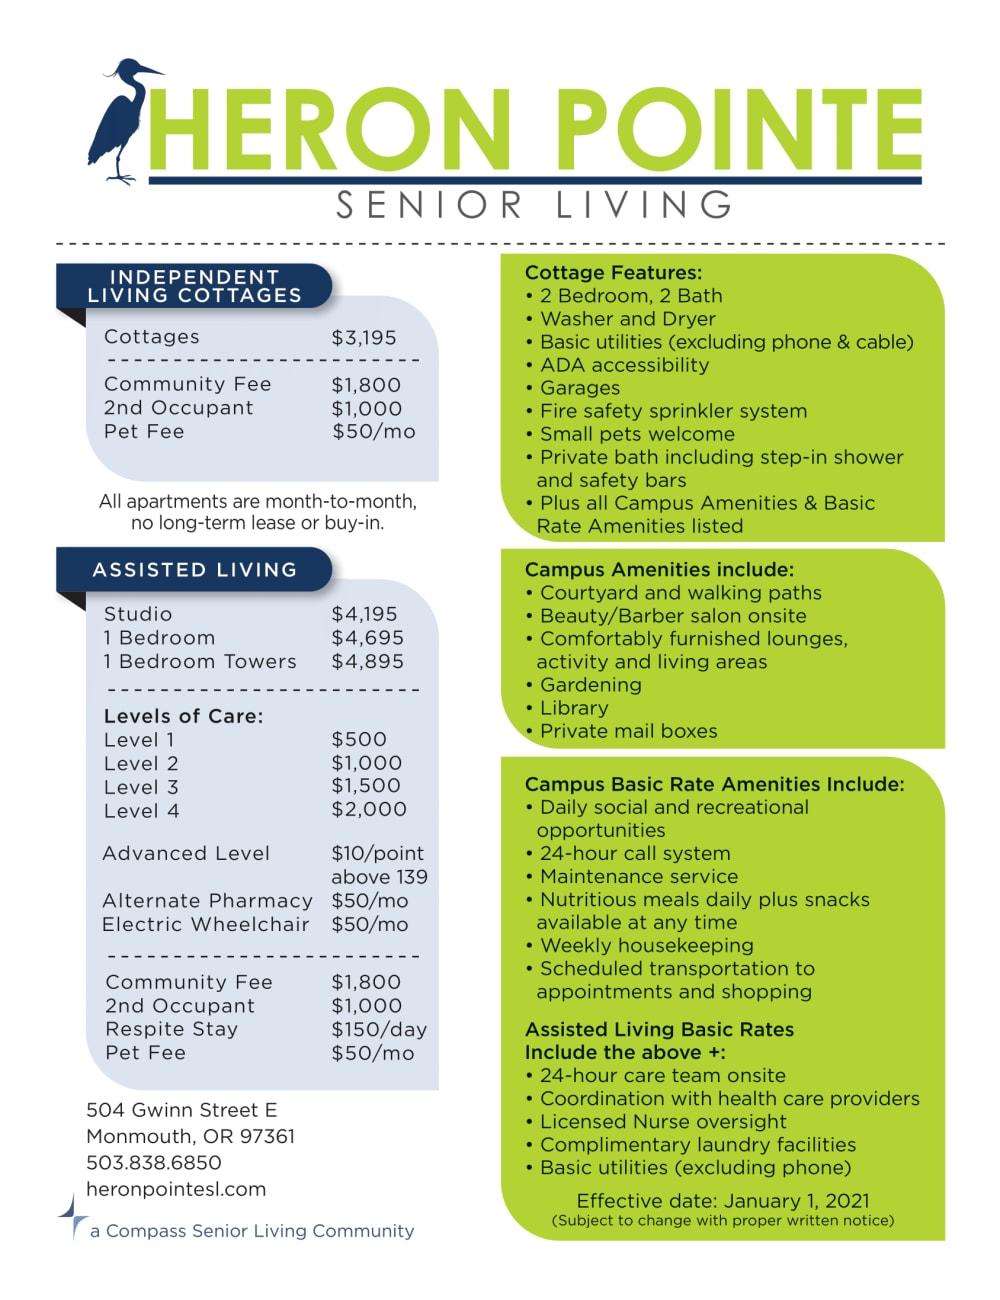 Heron Pointe Senior Living rates